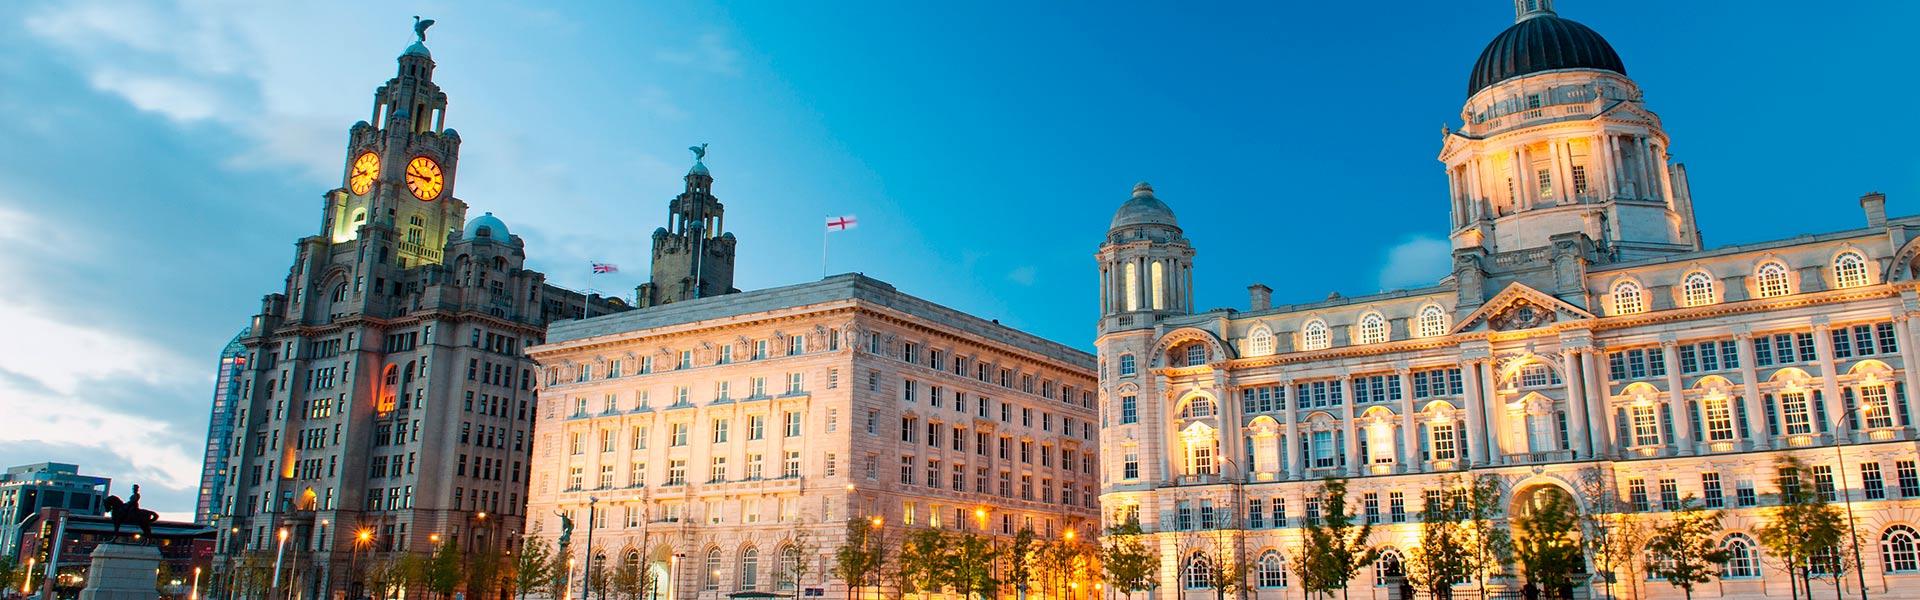 Cursos de inglés en Liverpool 2017 – Curso de inglés en el extranjero